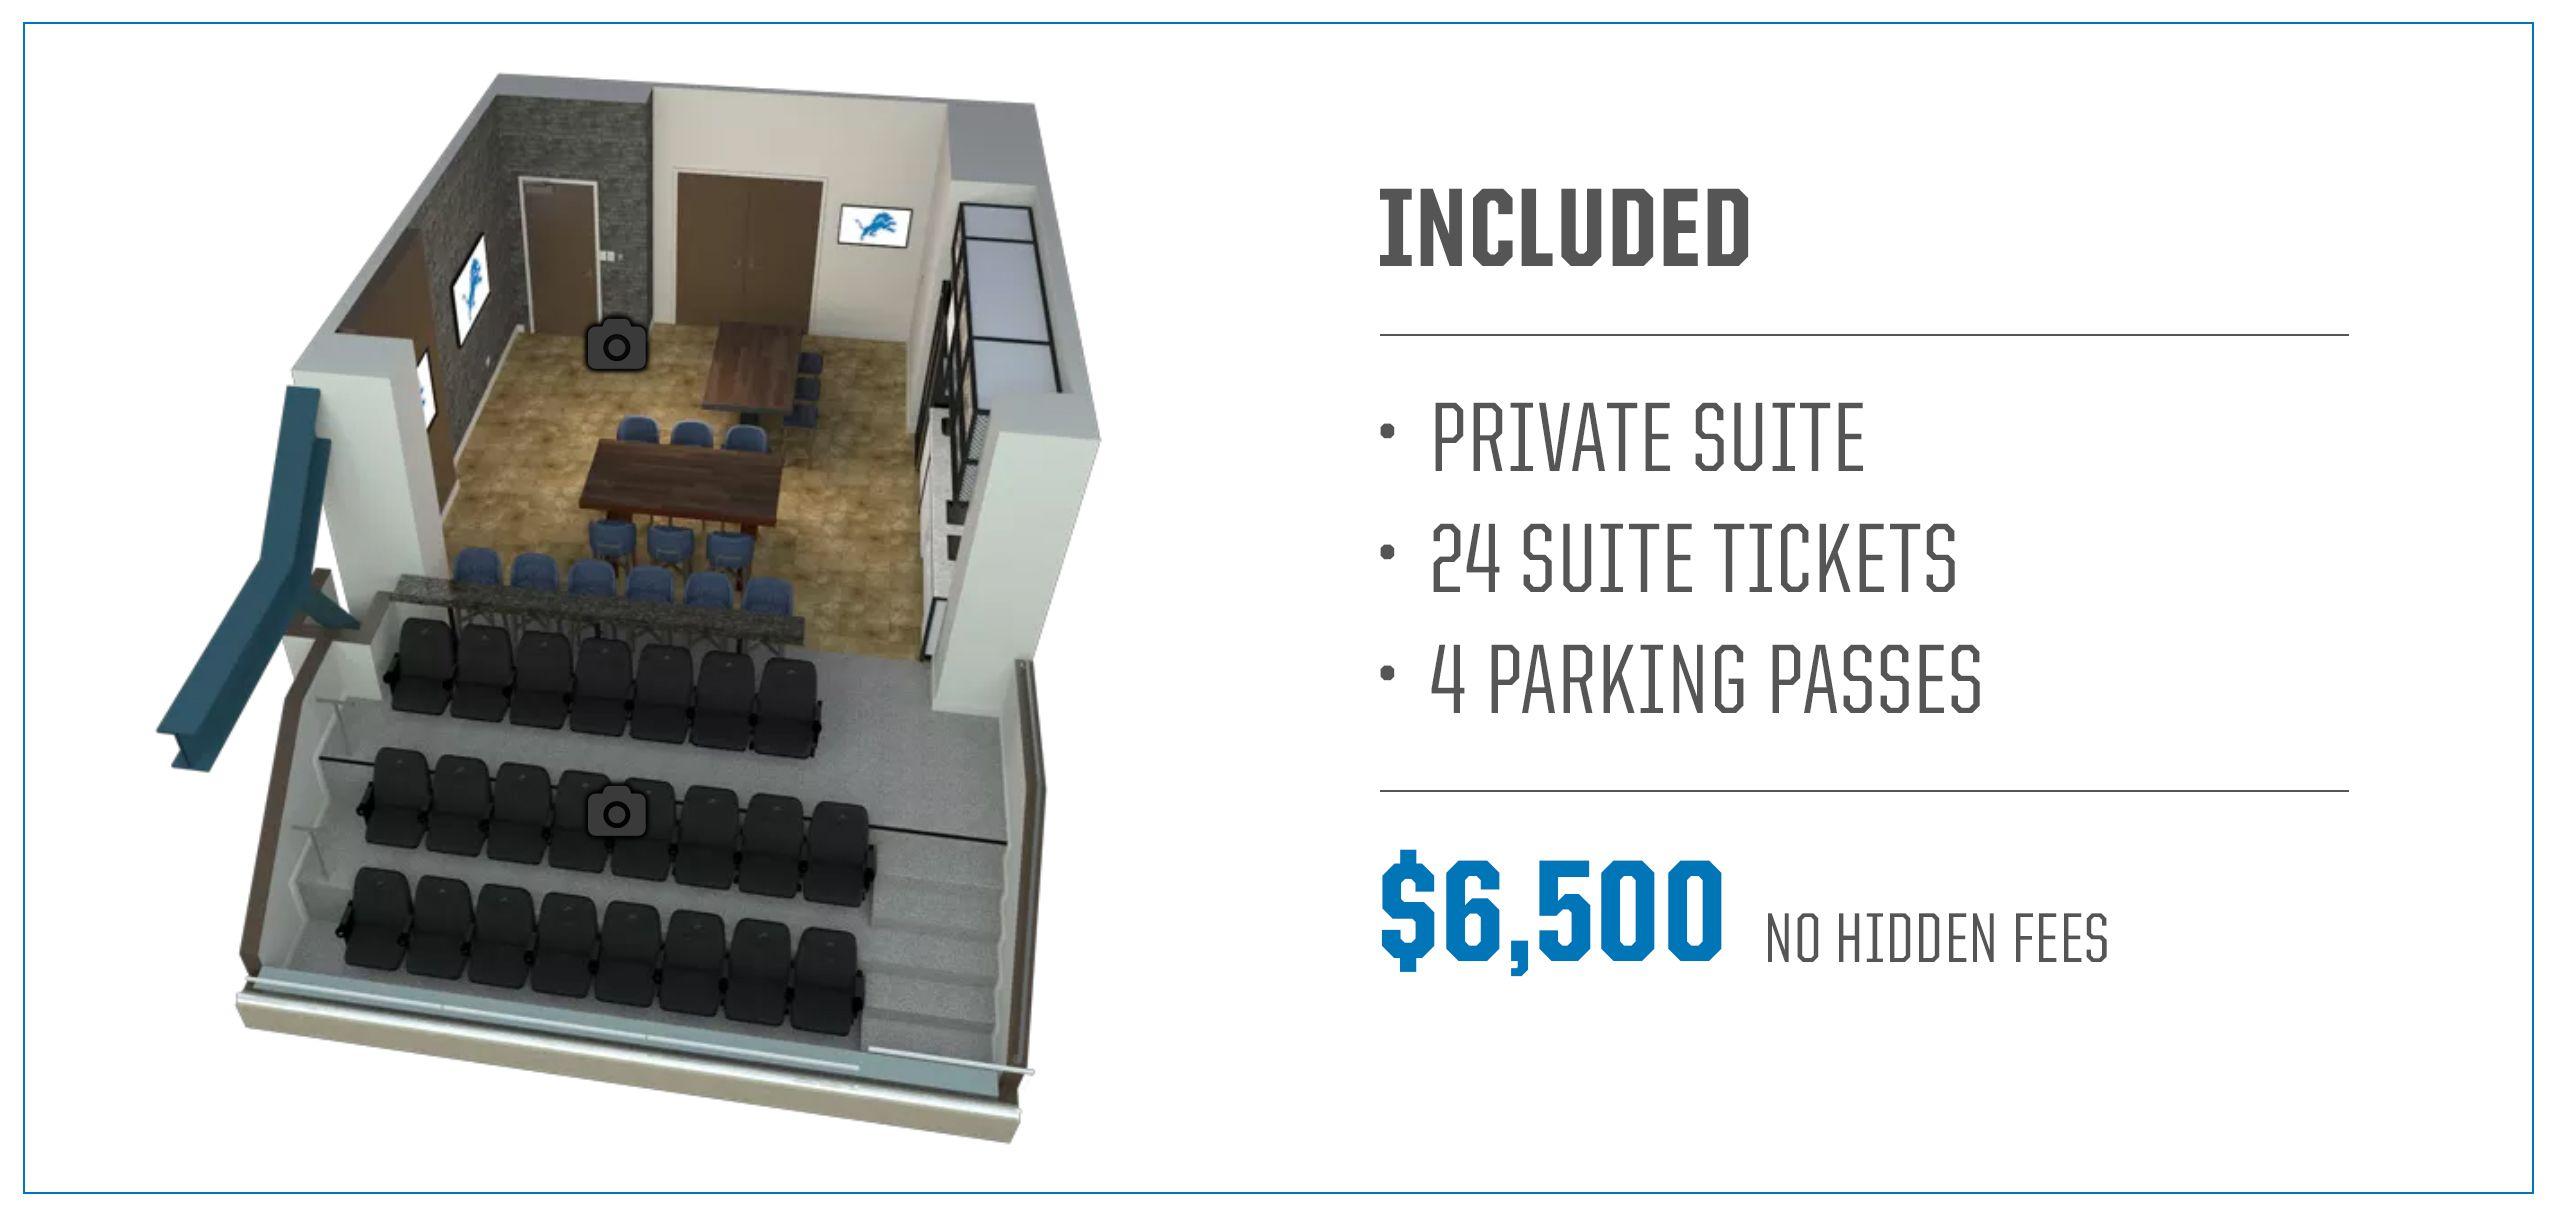 suite-purchase-information-map-417-garth